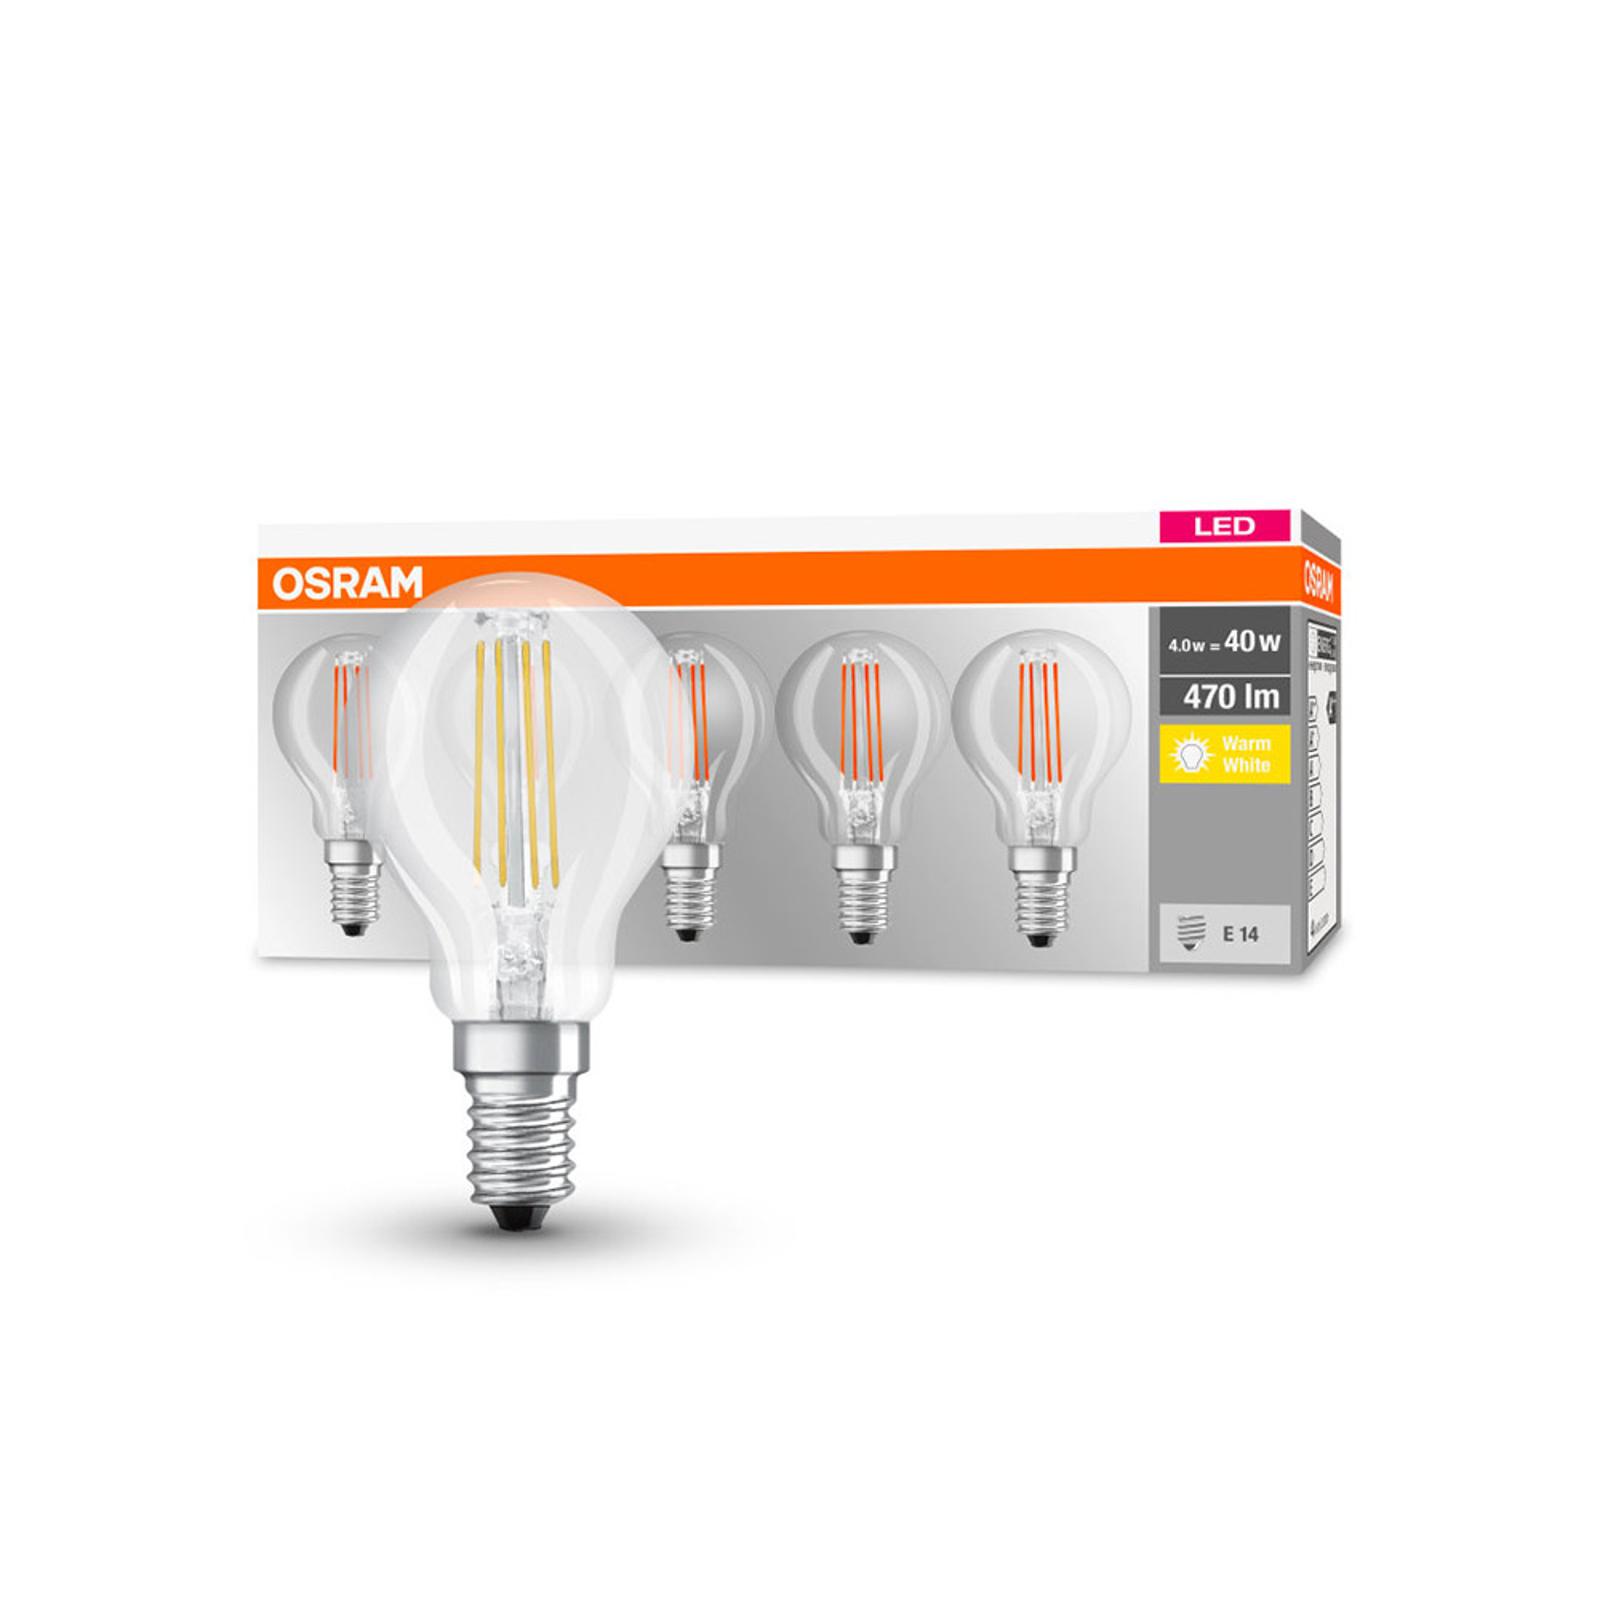 OSRAM LED-Lampe E14 P40 4W Filament 827 470lm 5er